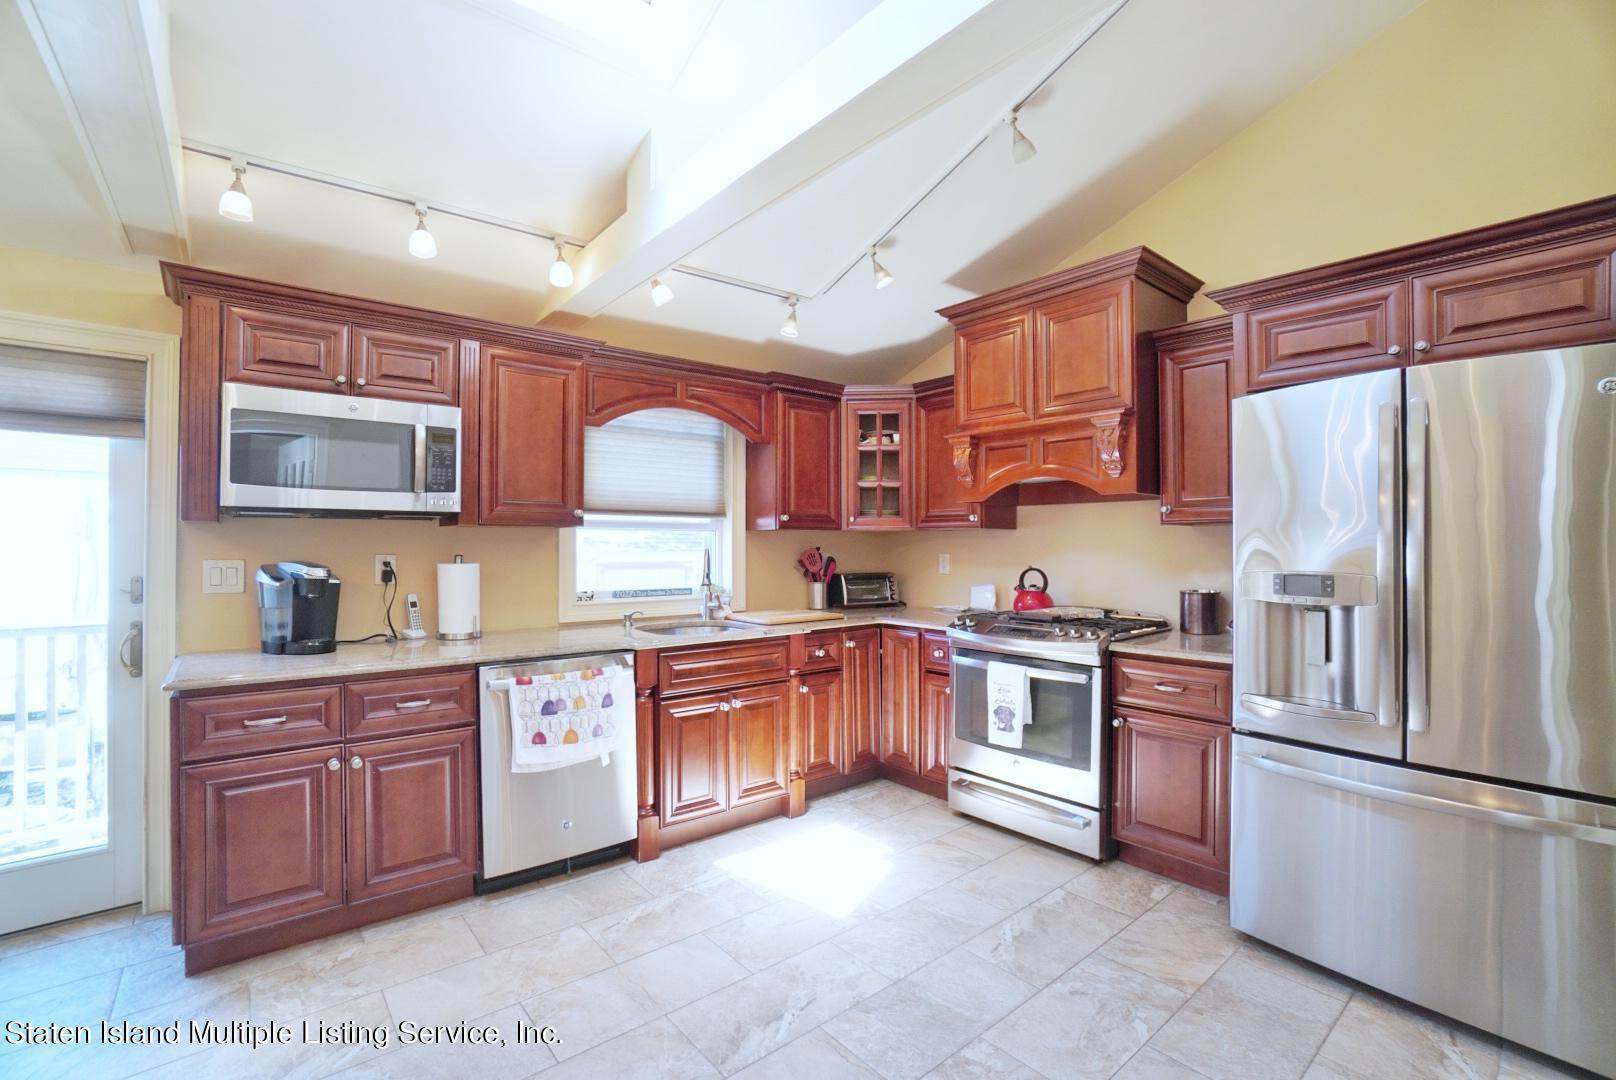 Single Family - Detached 264 Fisher Avenue  Staten Island, NY 10307, MLS-1146898-20